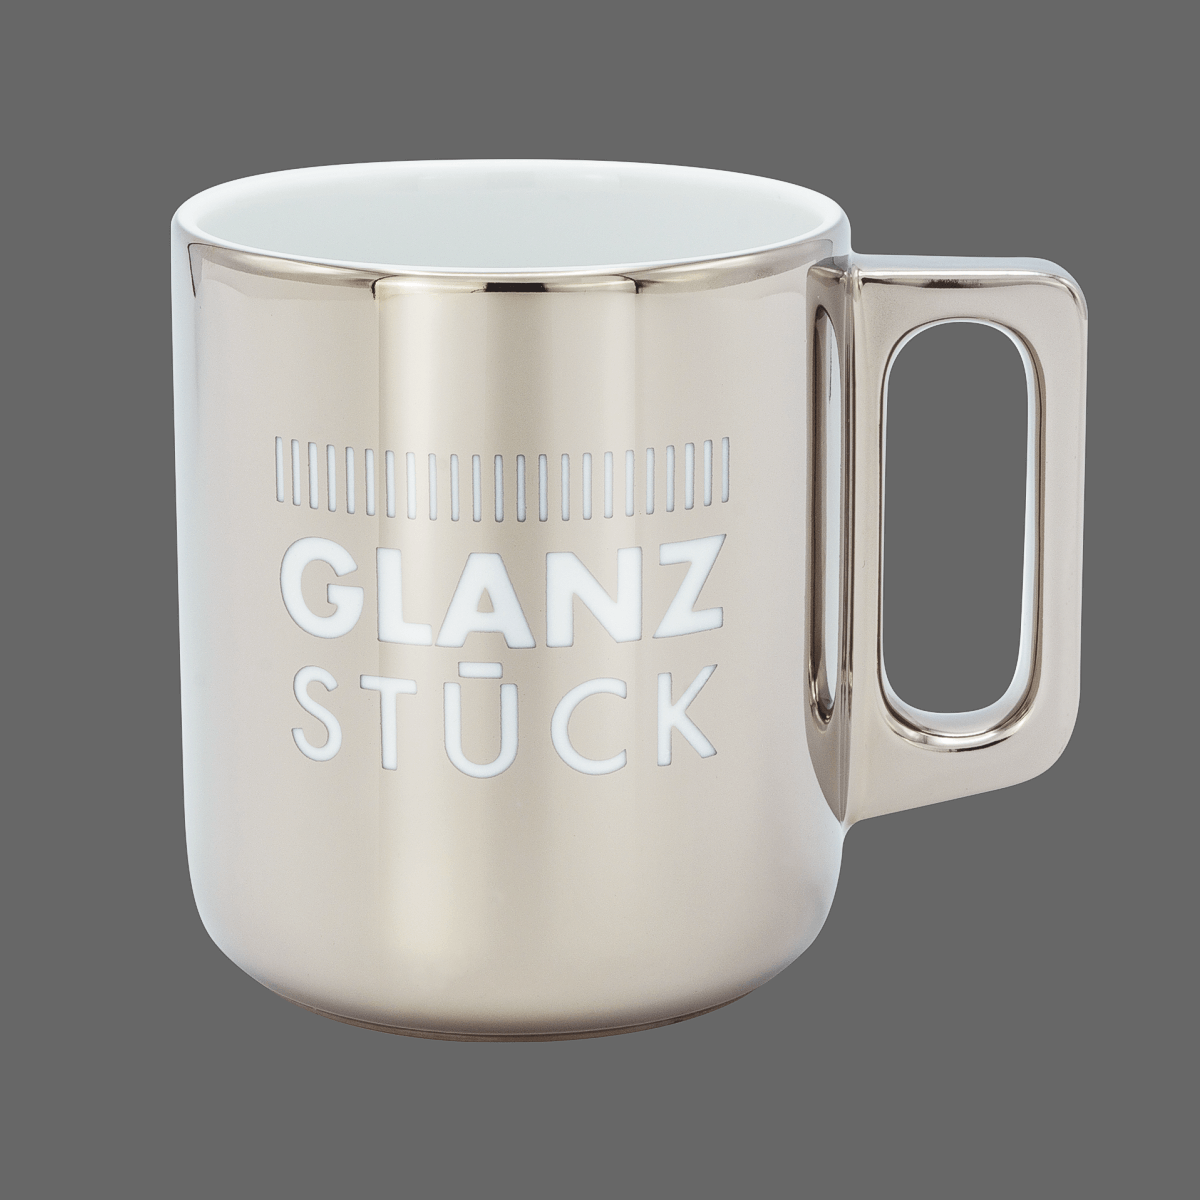 Nano Glanz_4 a